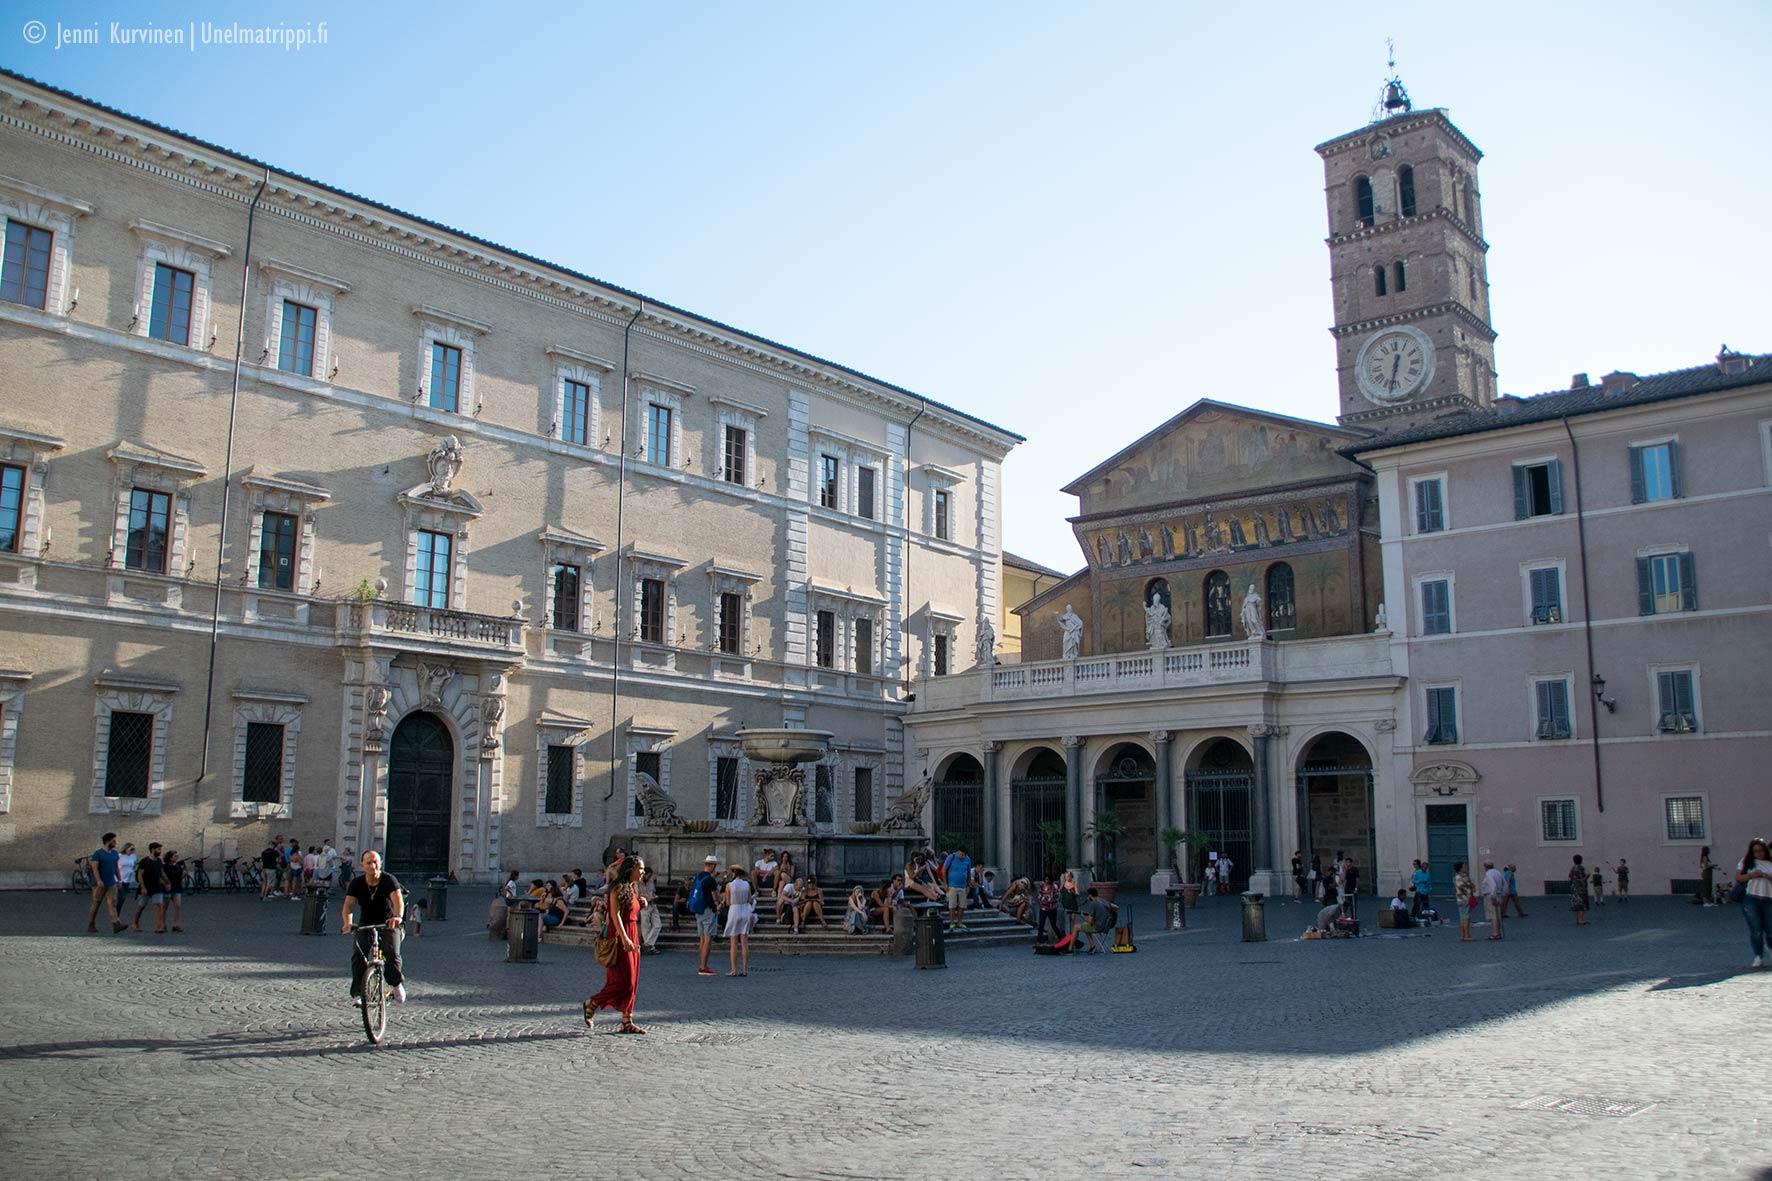 Santa Marian aukio, Trastevere